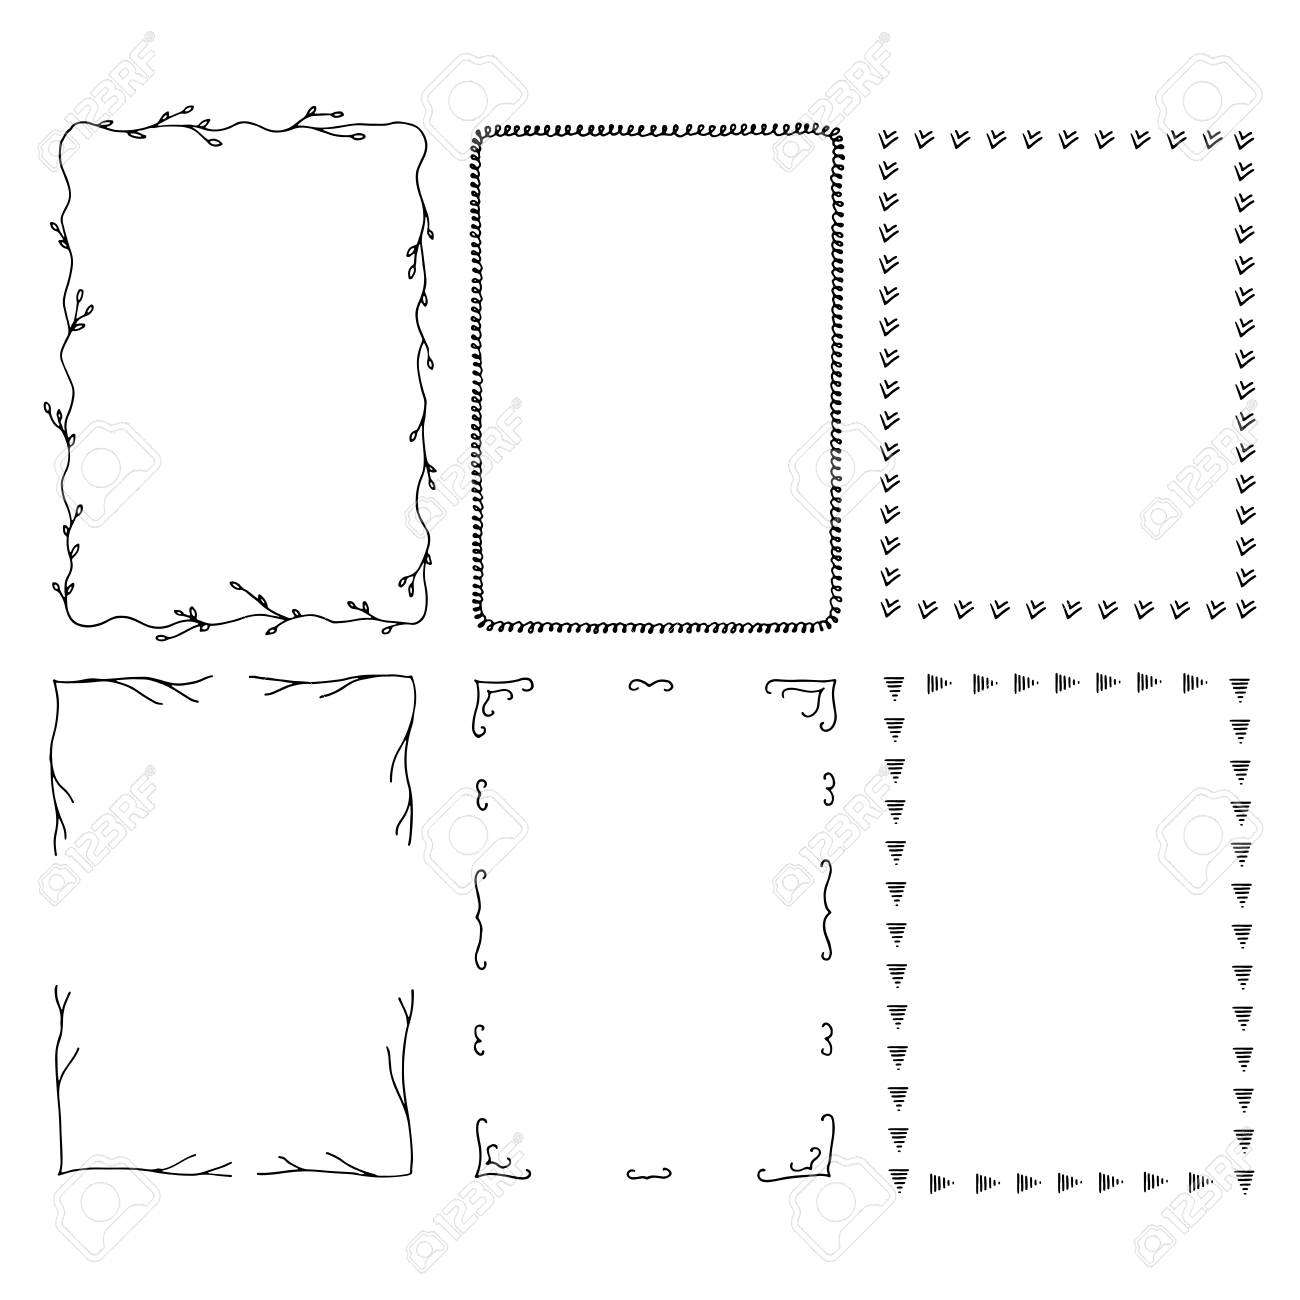 Hand Drawn Rectangular Frames Square Vector Illustration Royalty